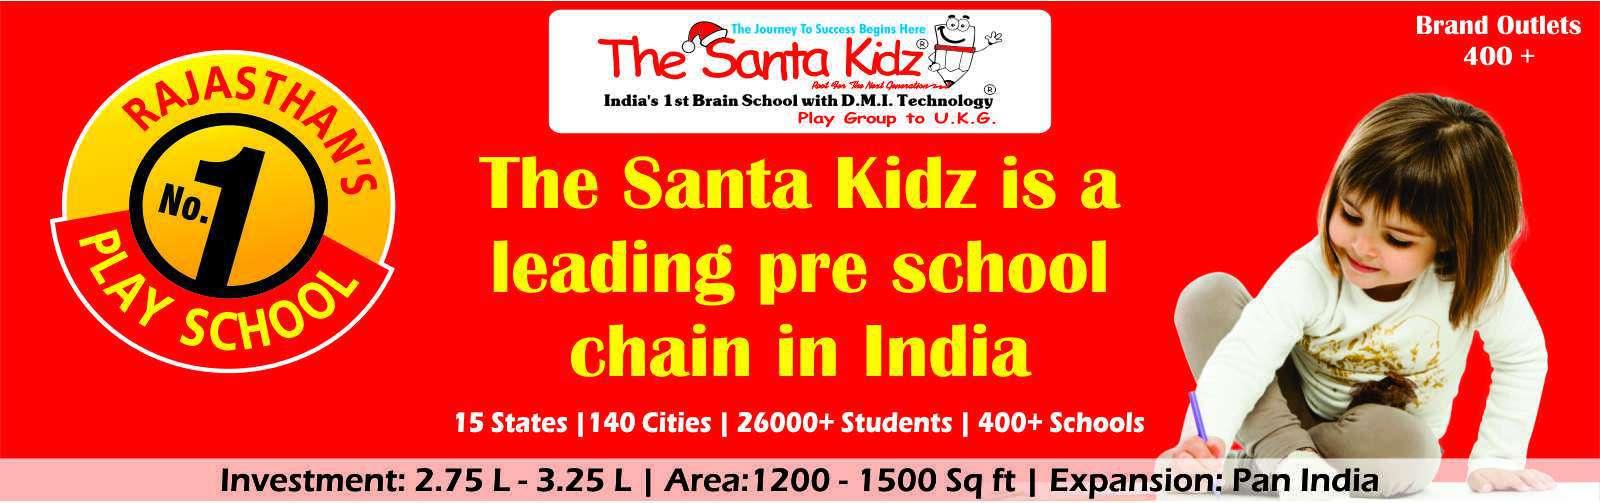 admin/photos/The Santa Kidz